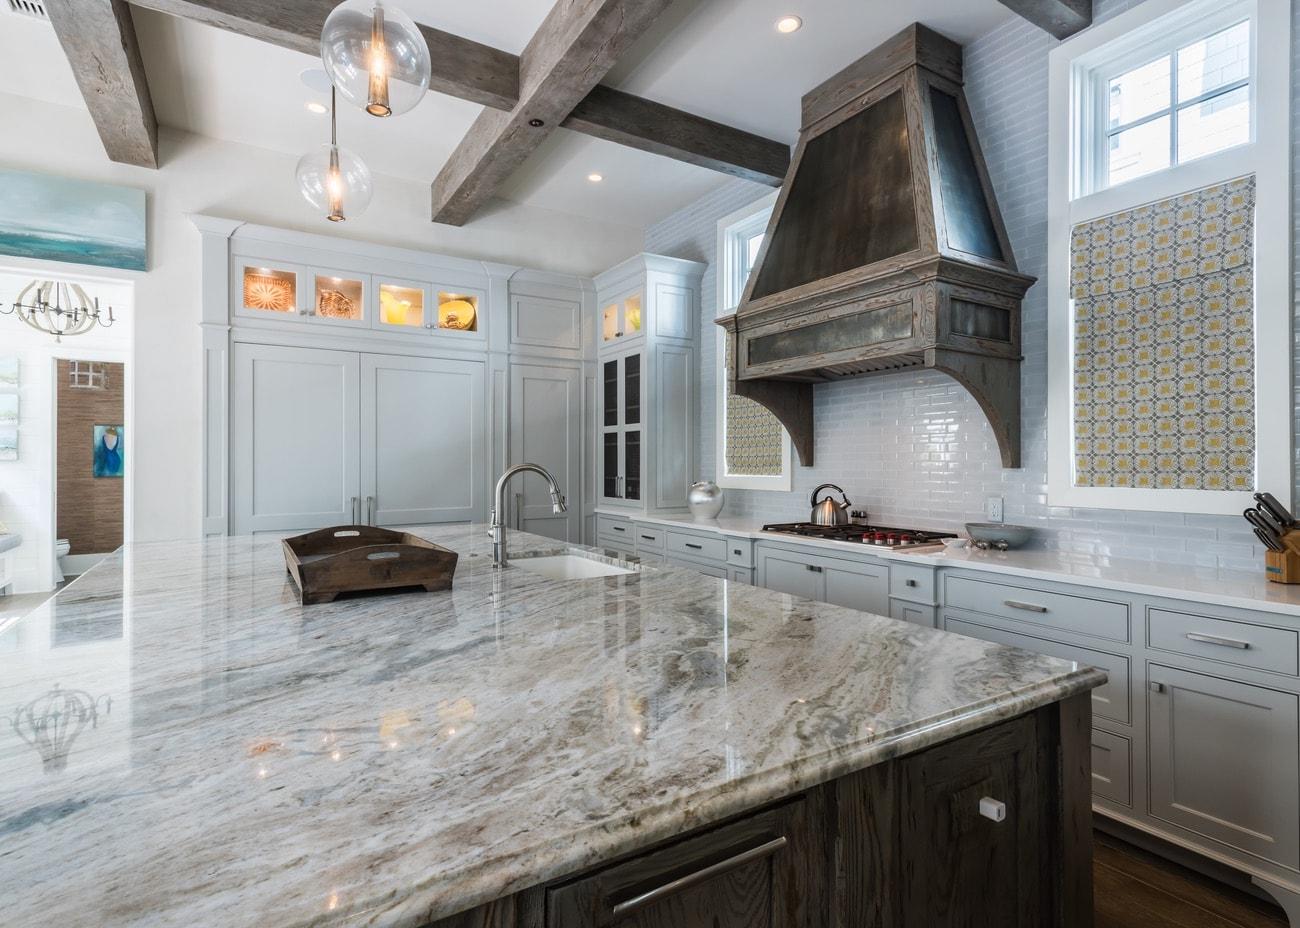 Home interior design by Sugar Beach Interiors, Panama City Beach, Florida, WaterSound